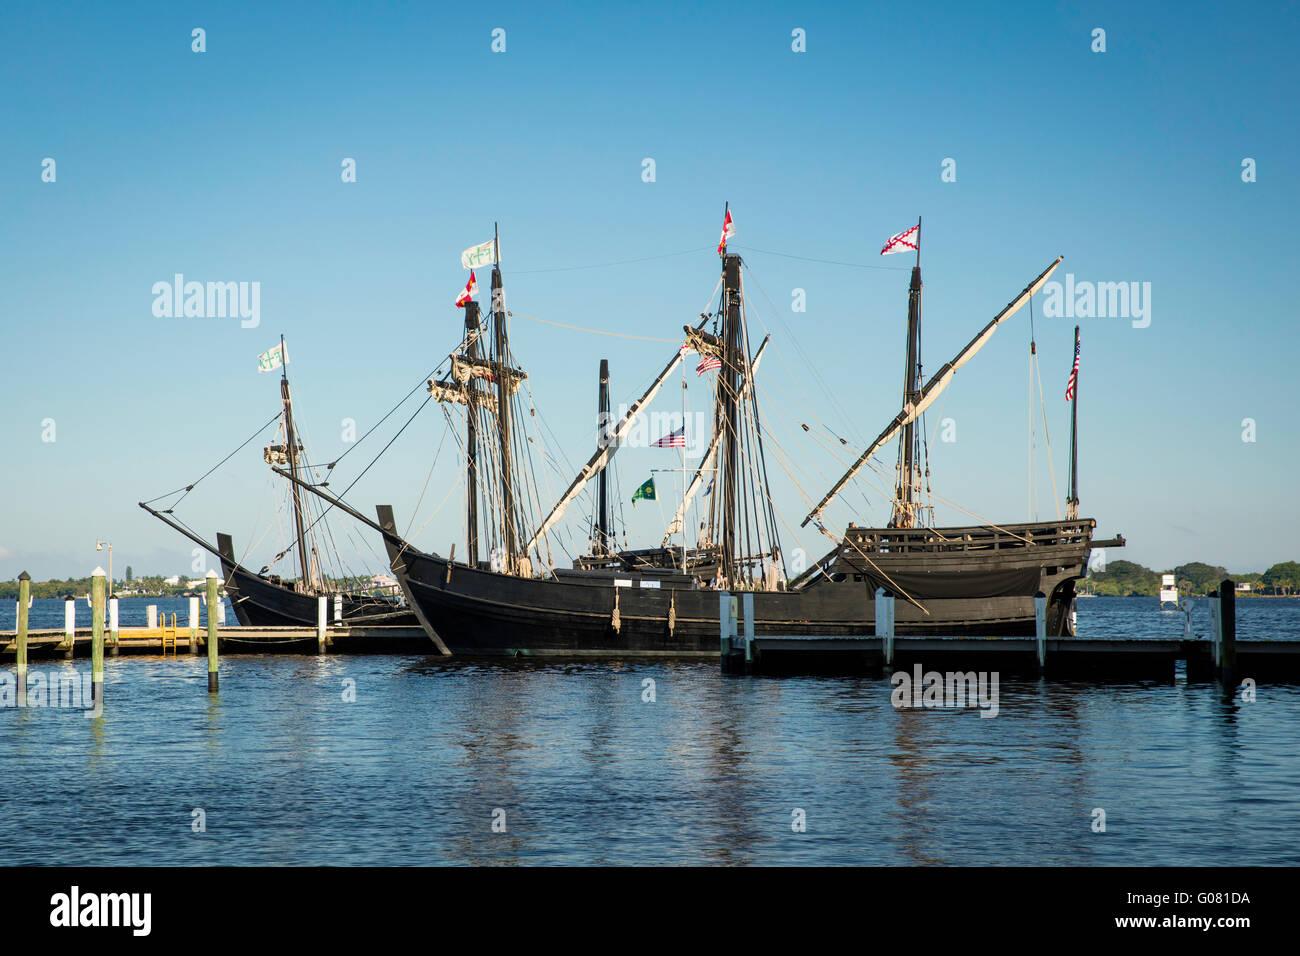 Replicas of Christopher Columbus' ships, Nina and Pinta docked in Ft. Myers, Florida, USA - Stock Image